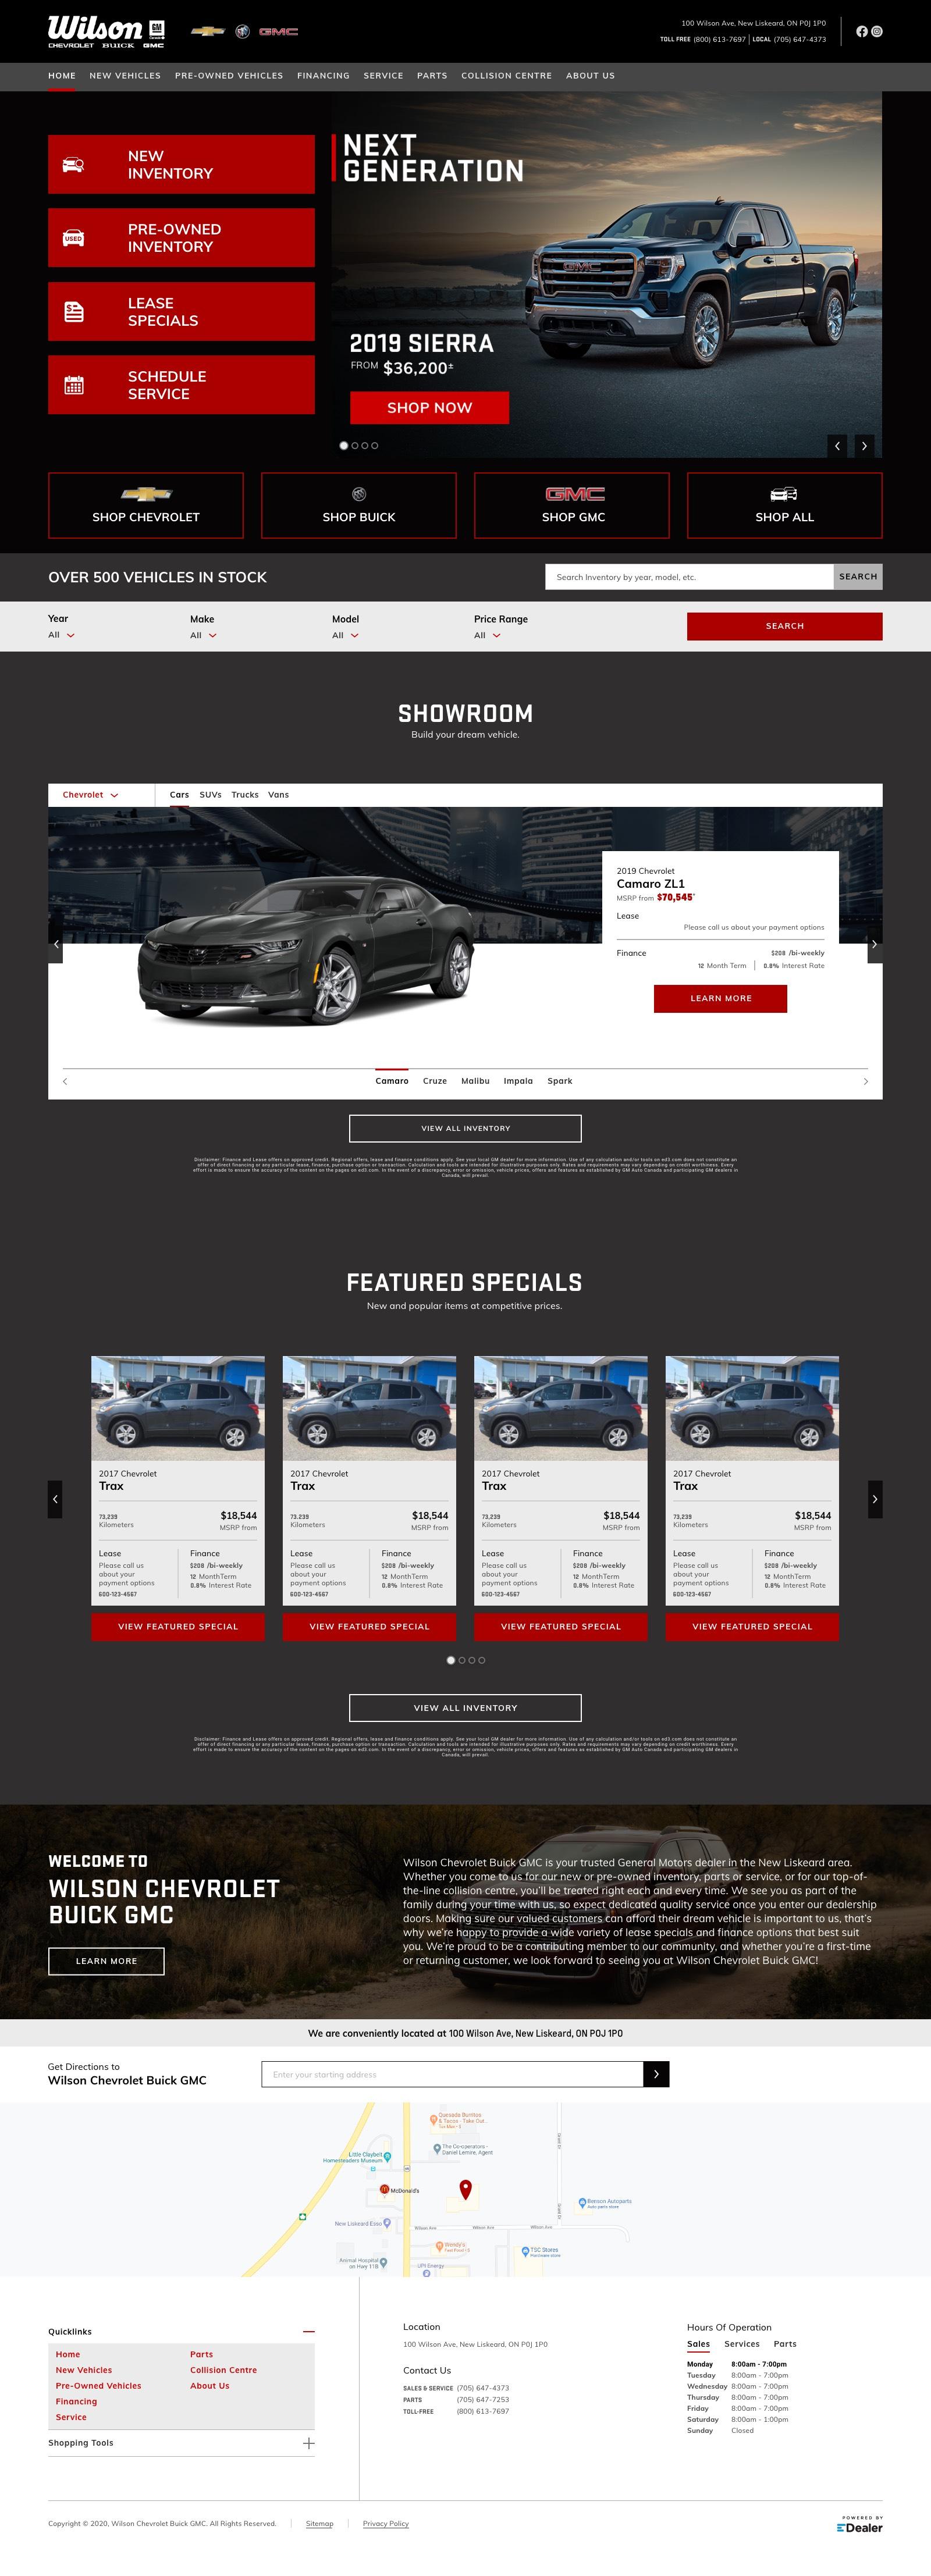 Wilson Chevrolet Buick GMC